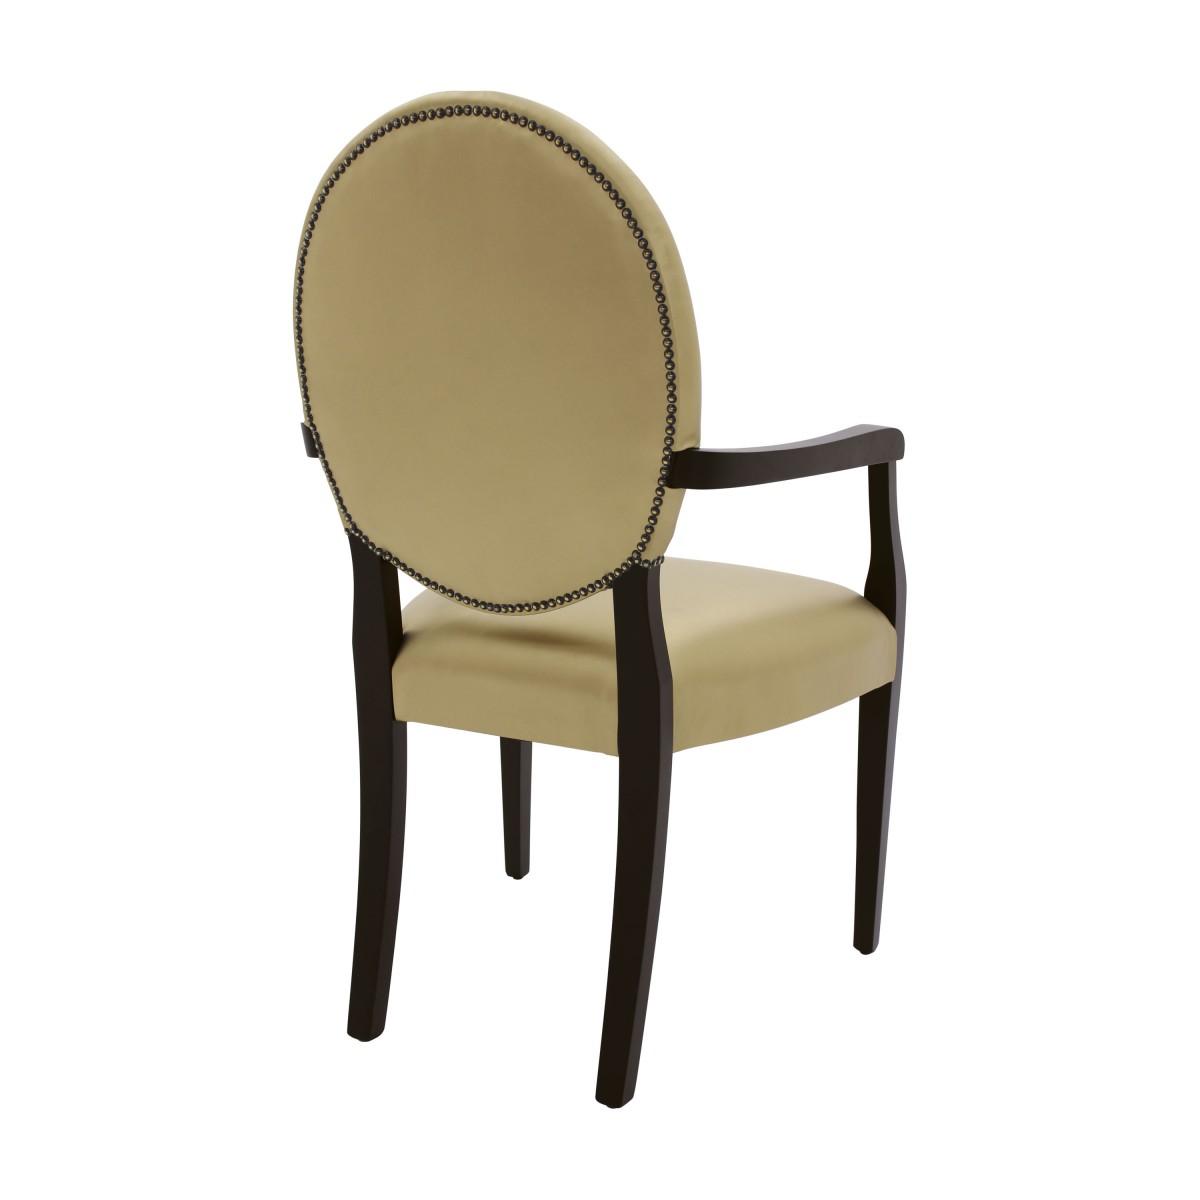 Small armchair Favola - Sevensedie